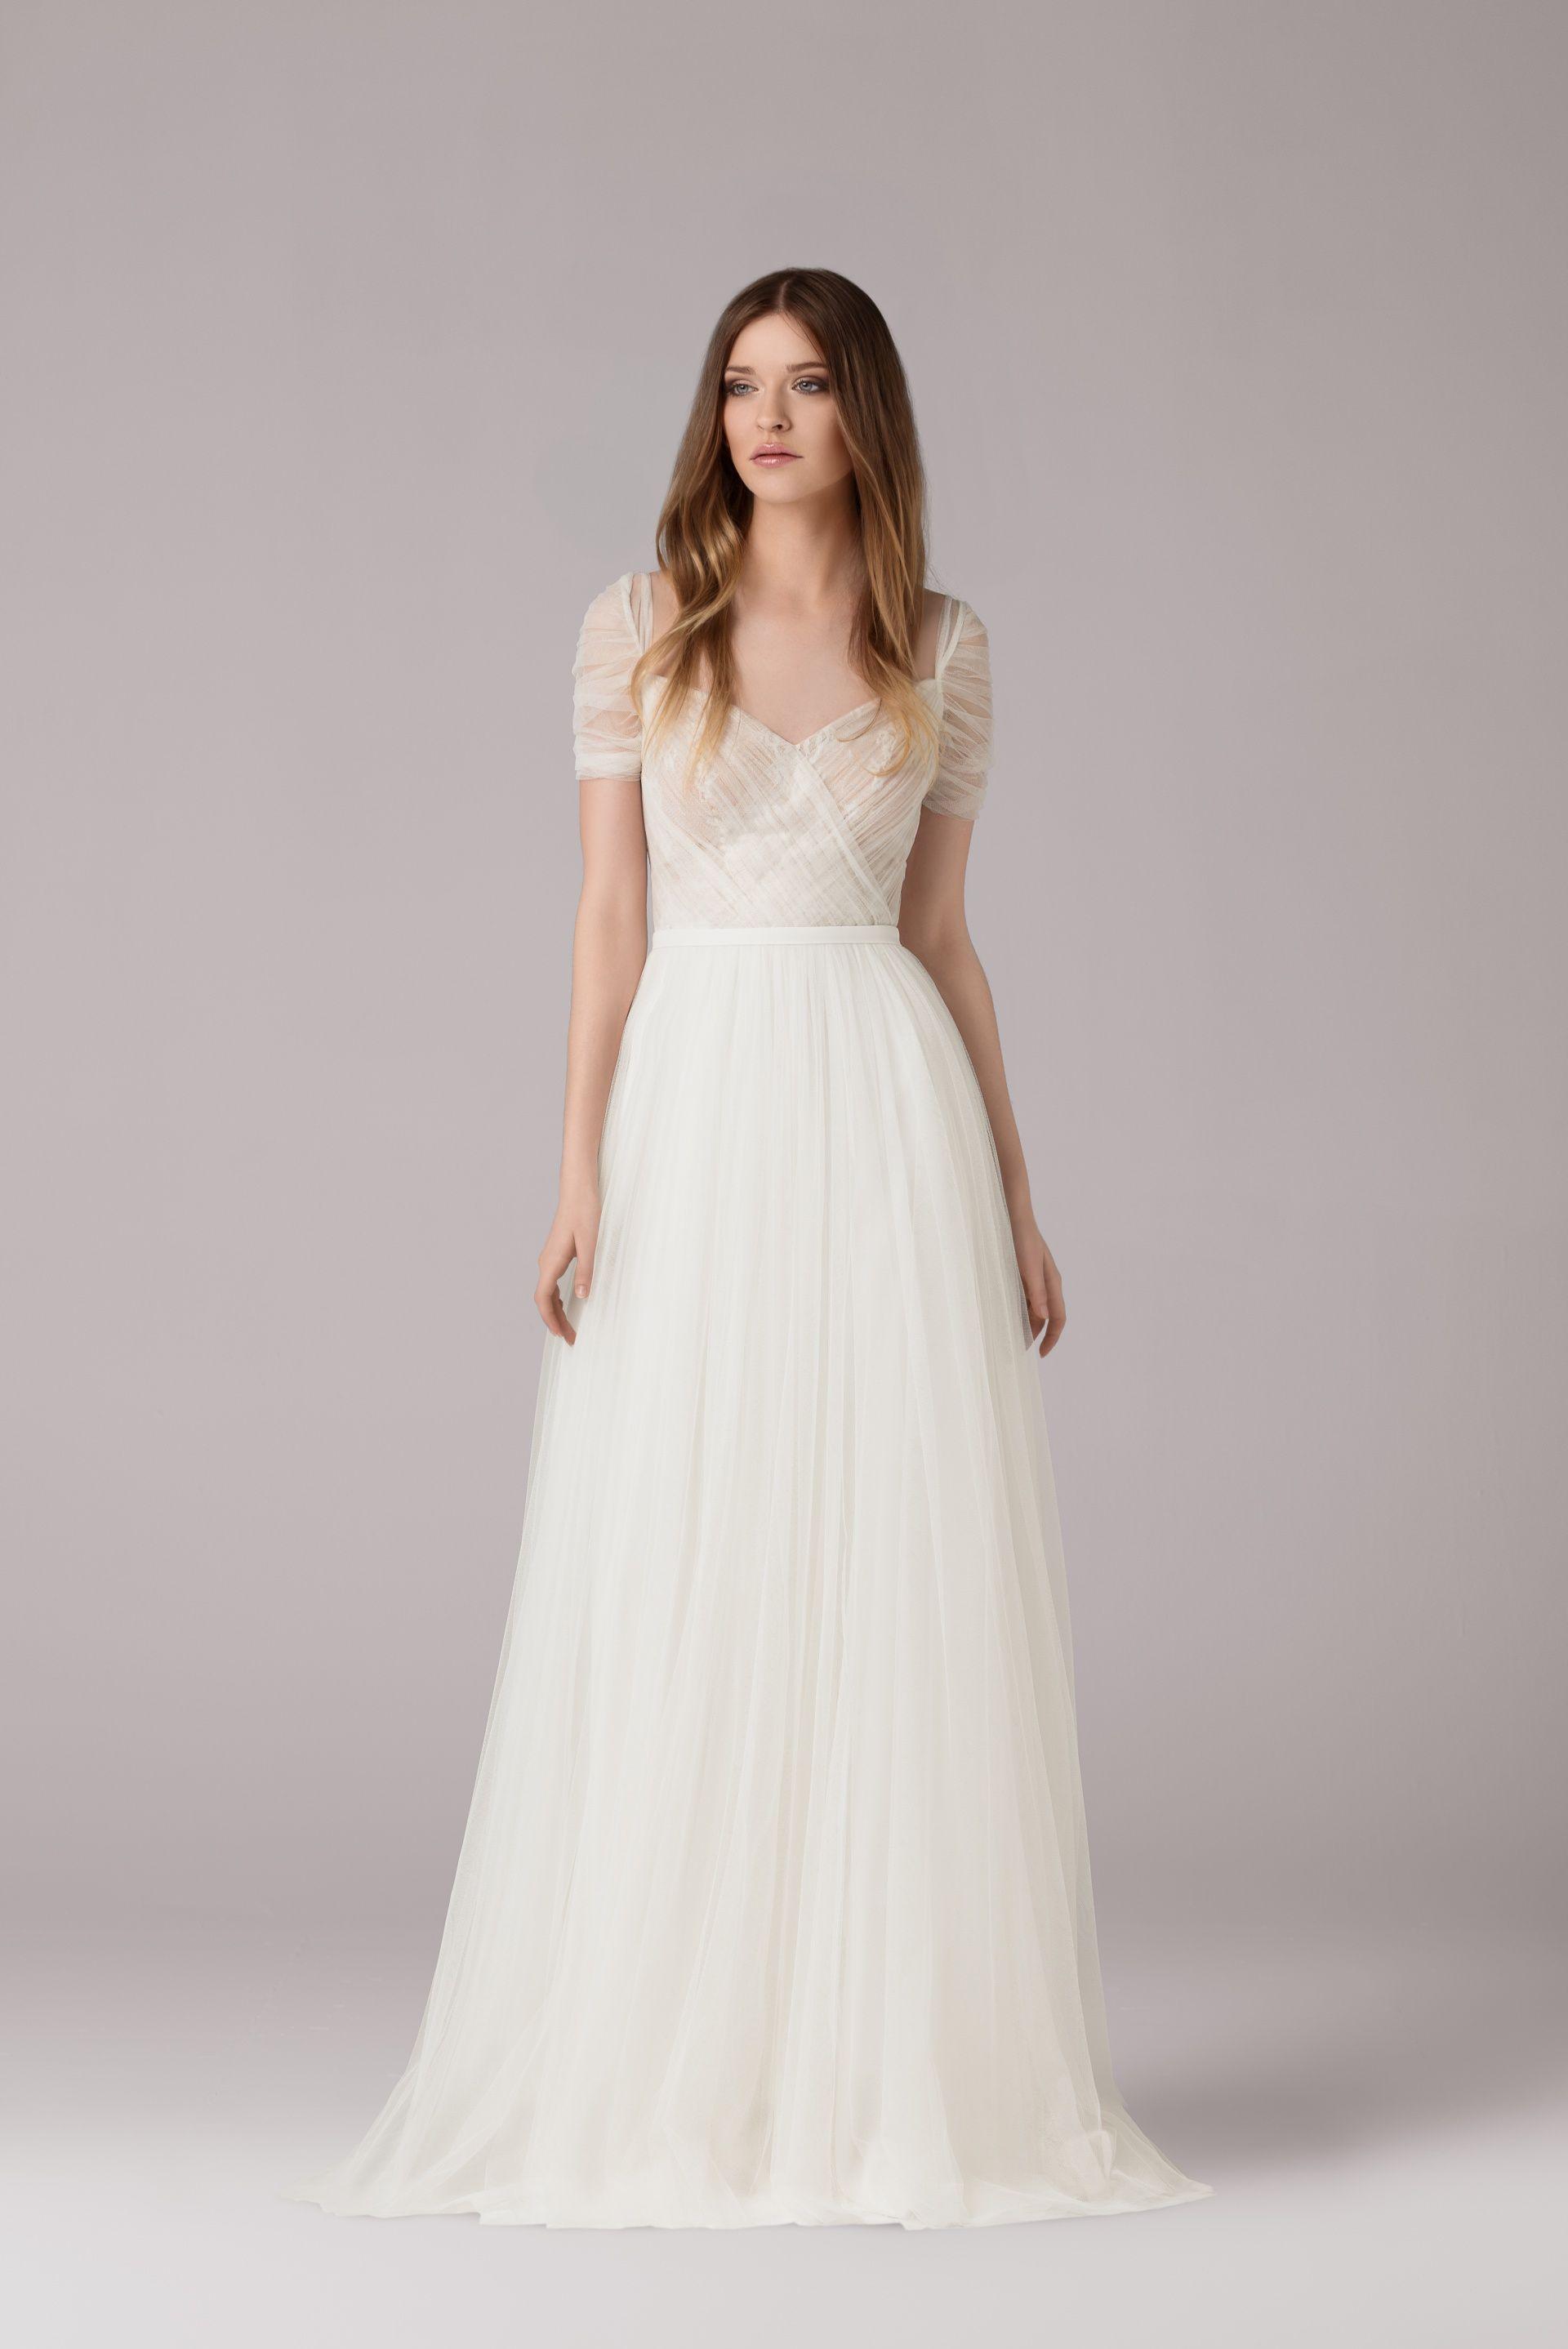 df7765517ce8a ANNA KARA gorgeous simply wedding dress | inspirations in 2019 ...